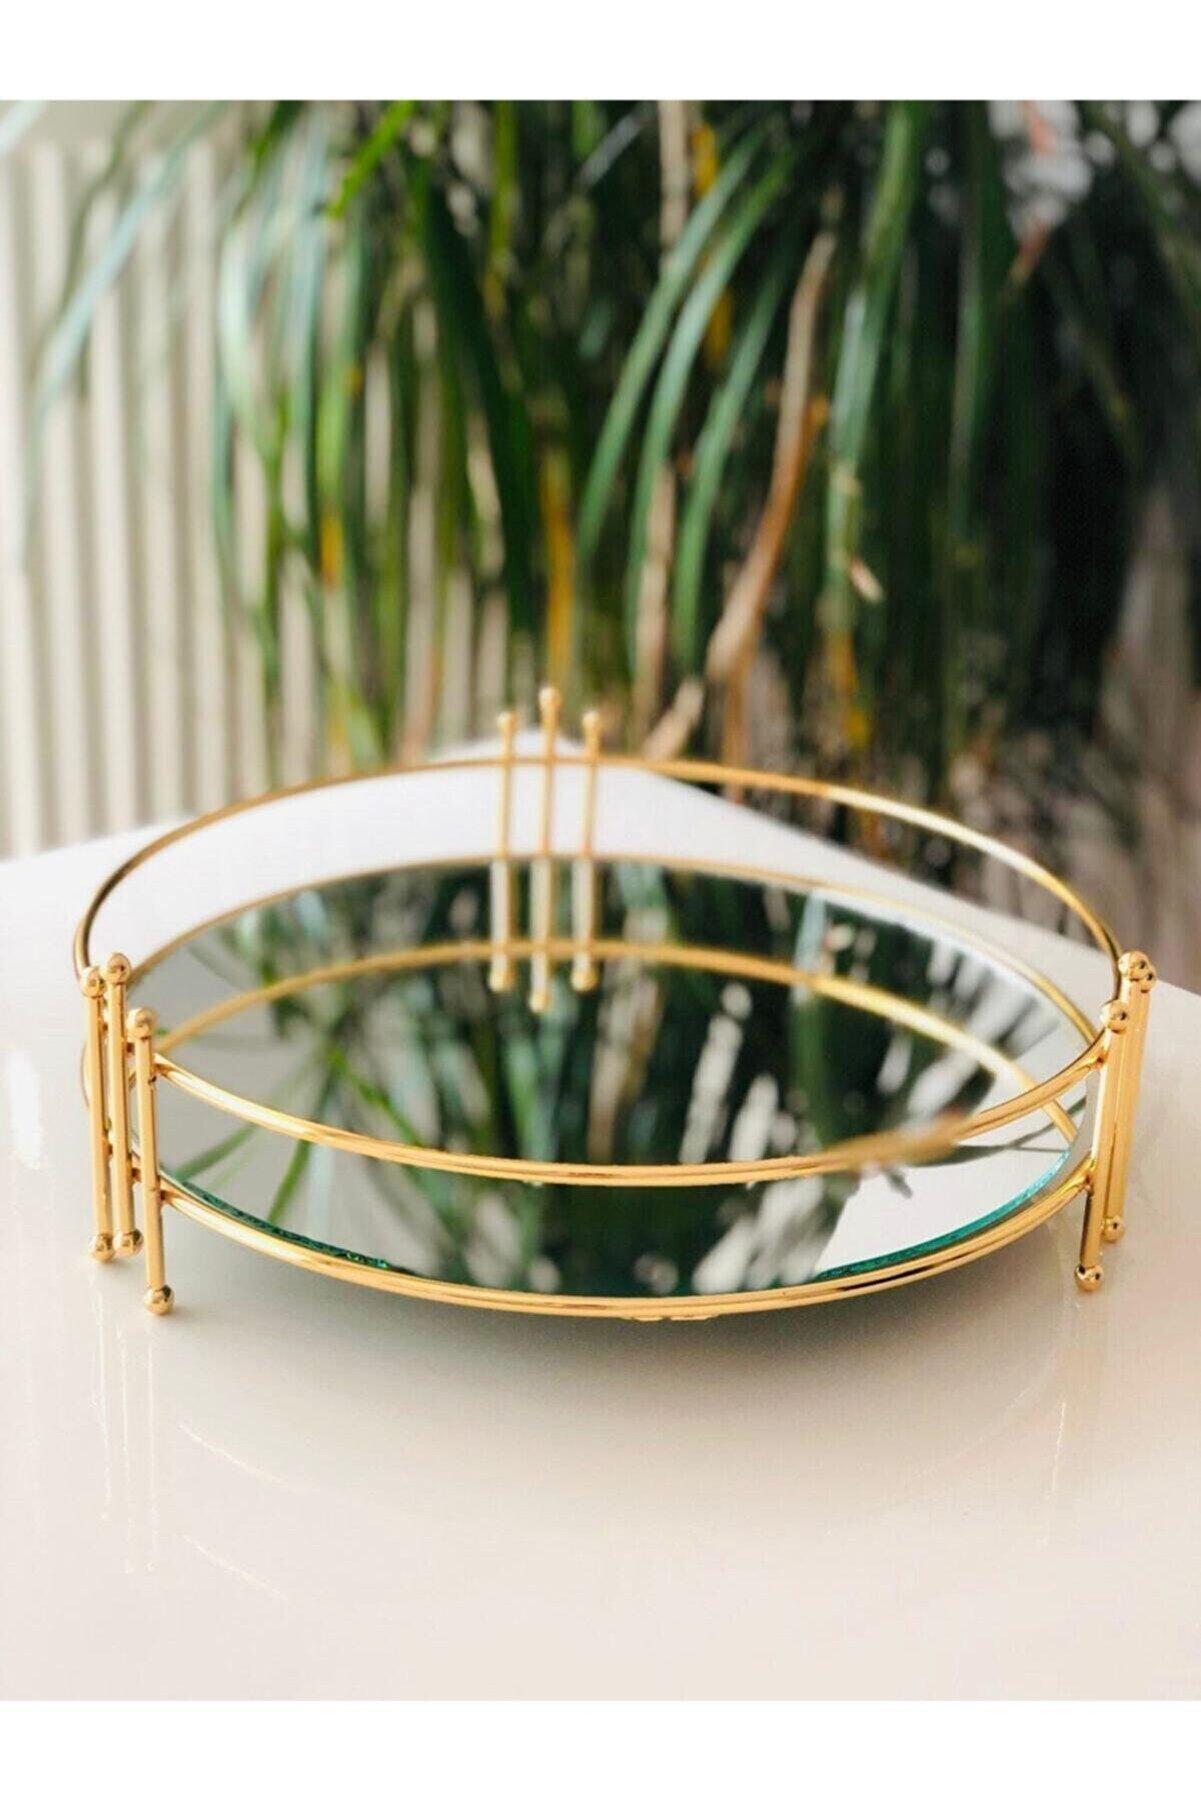 Sillage Home Yuvarlak Gold Aynalı Tepsi